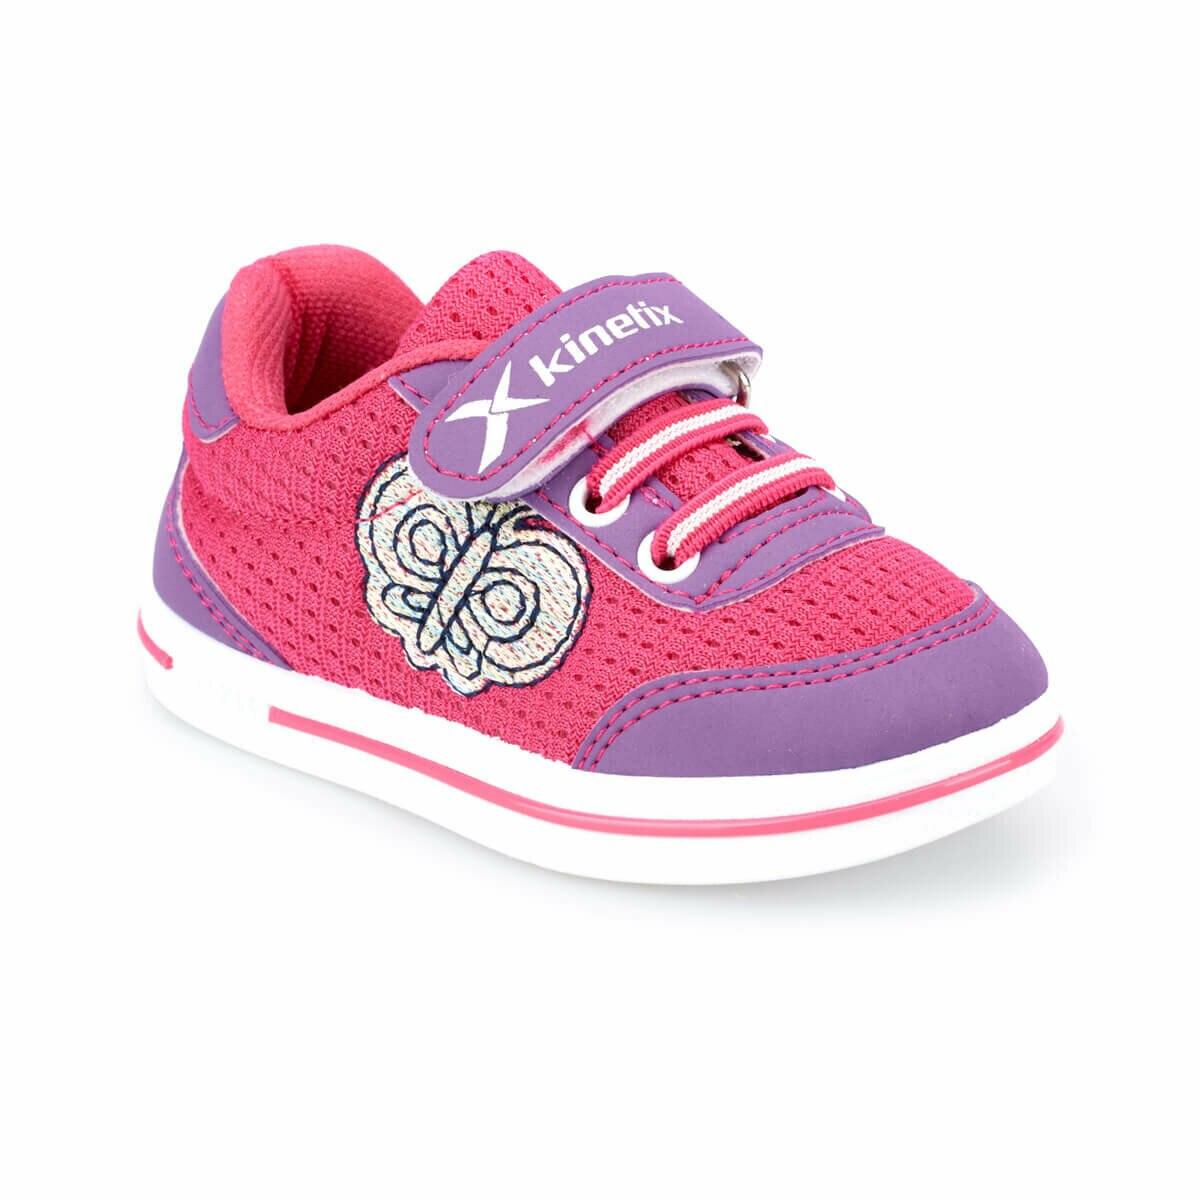 FLO CRANK Fuchsia Female Child Sneaker Shoes KINETIX